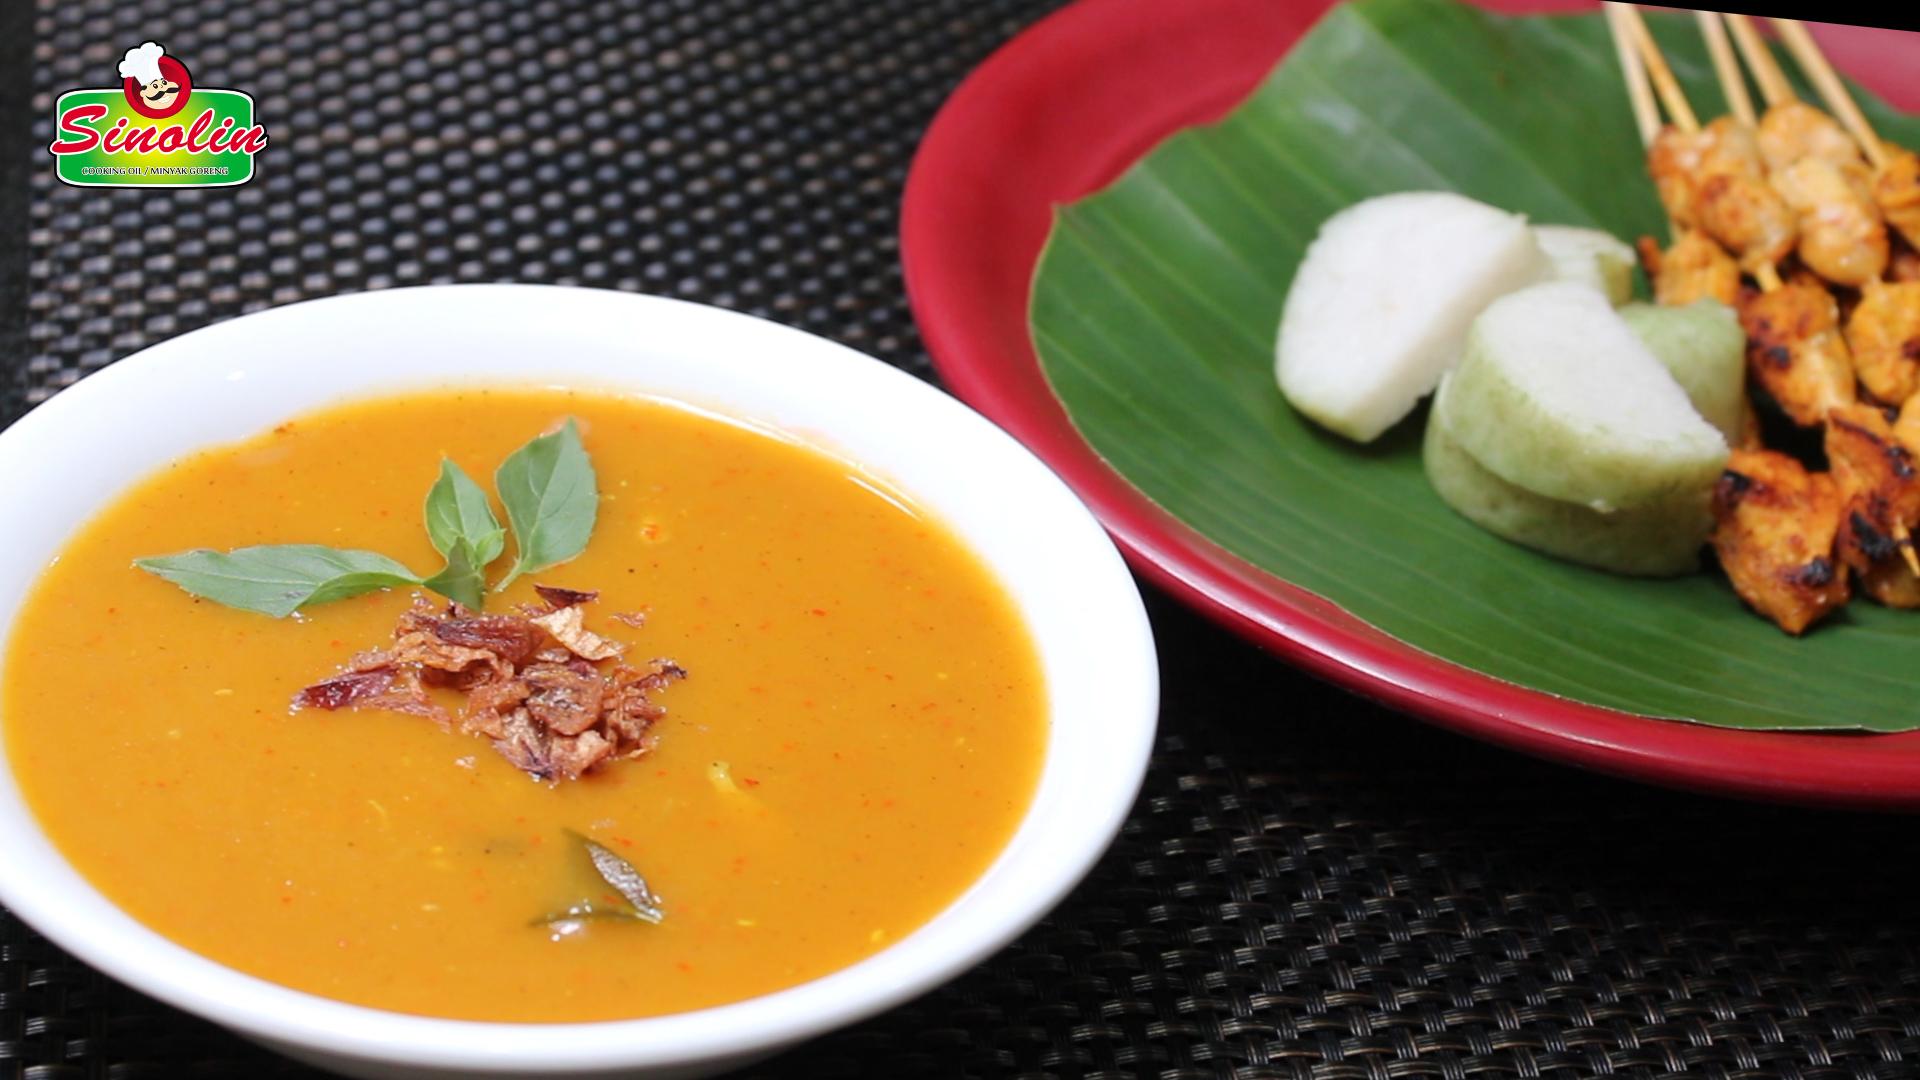 Padang Satay Sauce By Dapur Sinolin